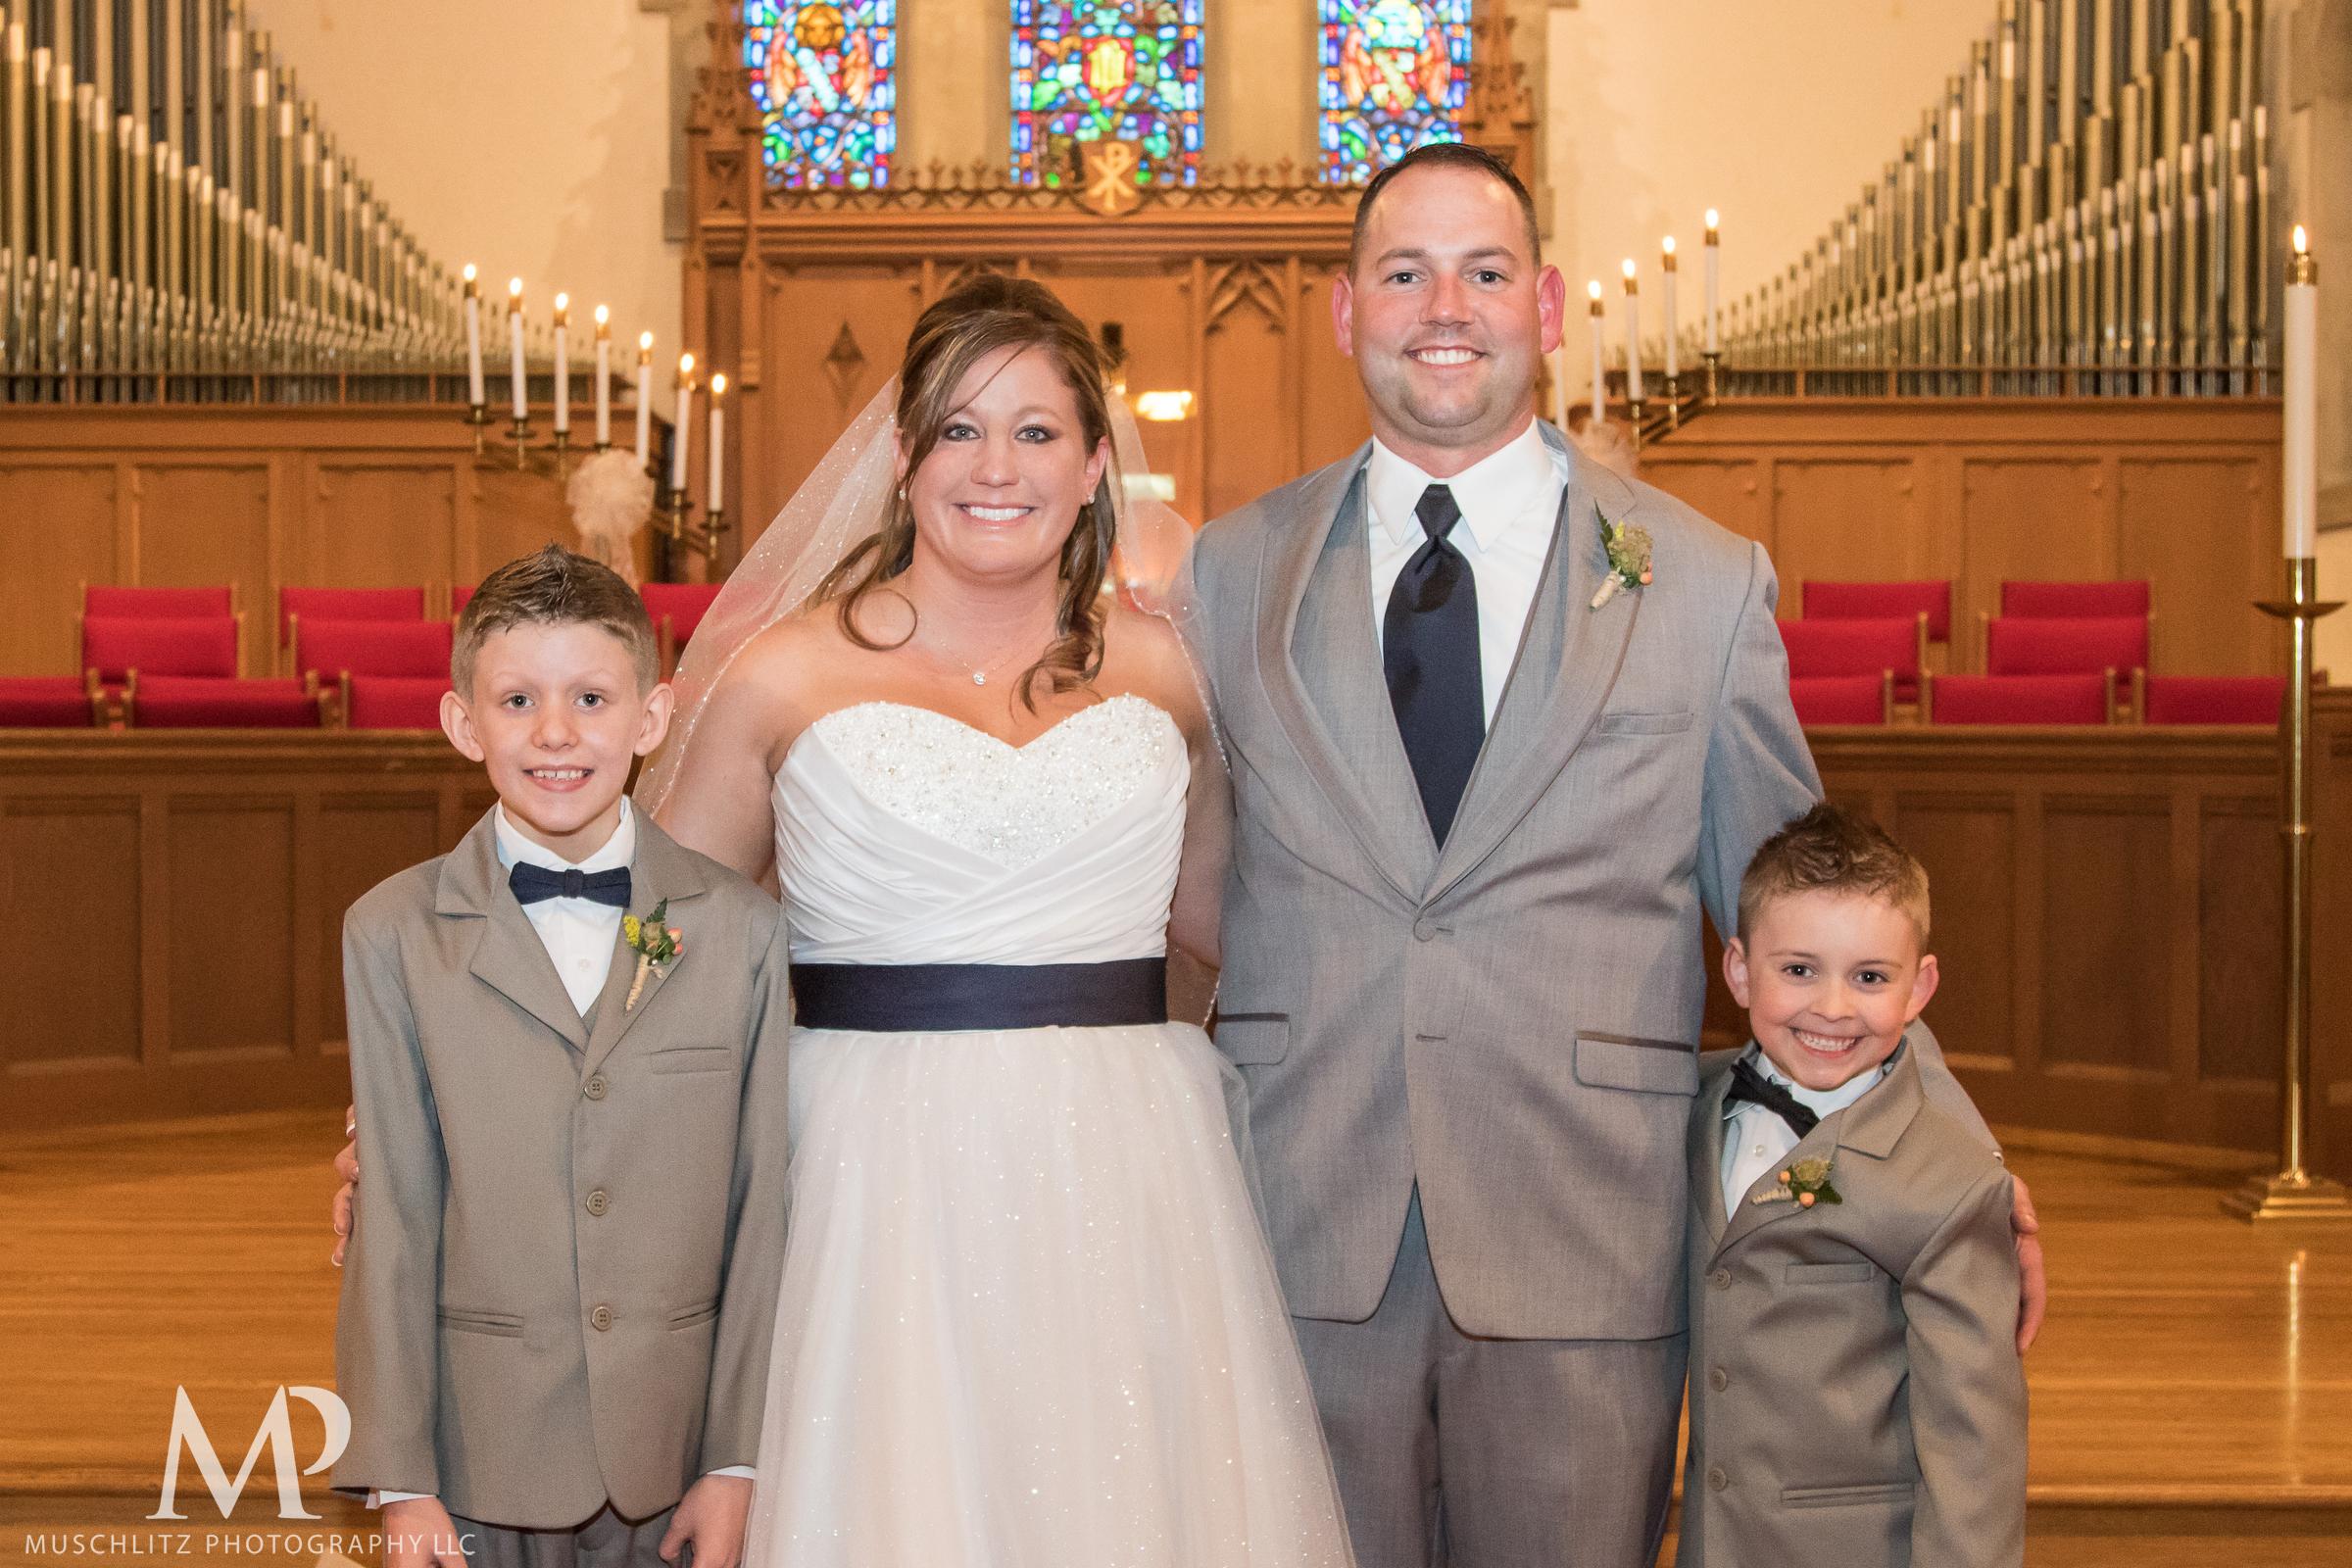 Overbrook-presbyterian-church-wedding-columbus-030.JPG